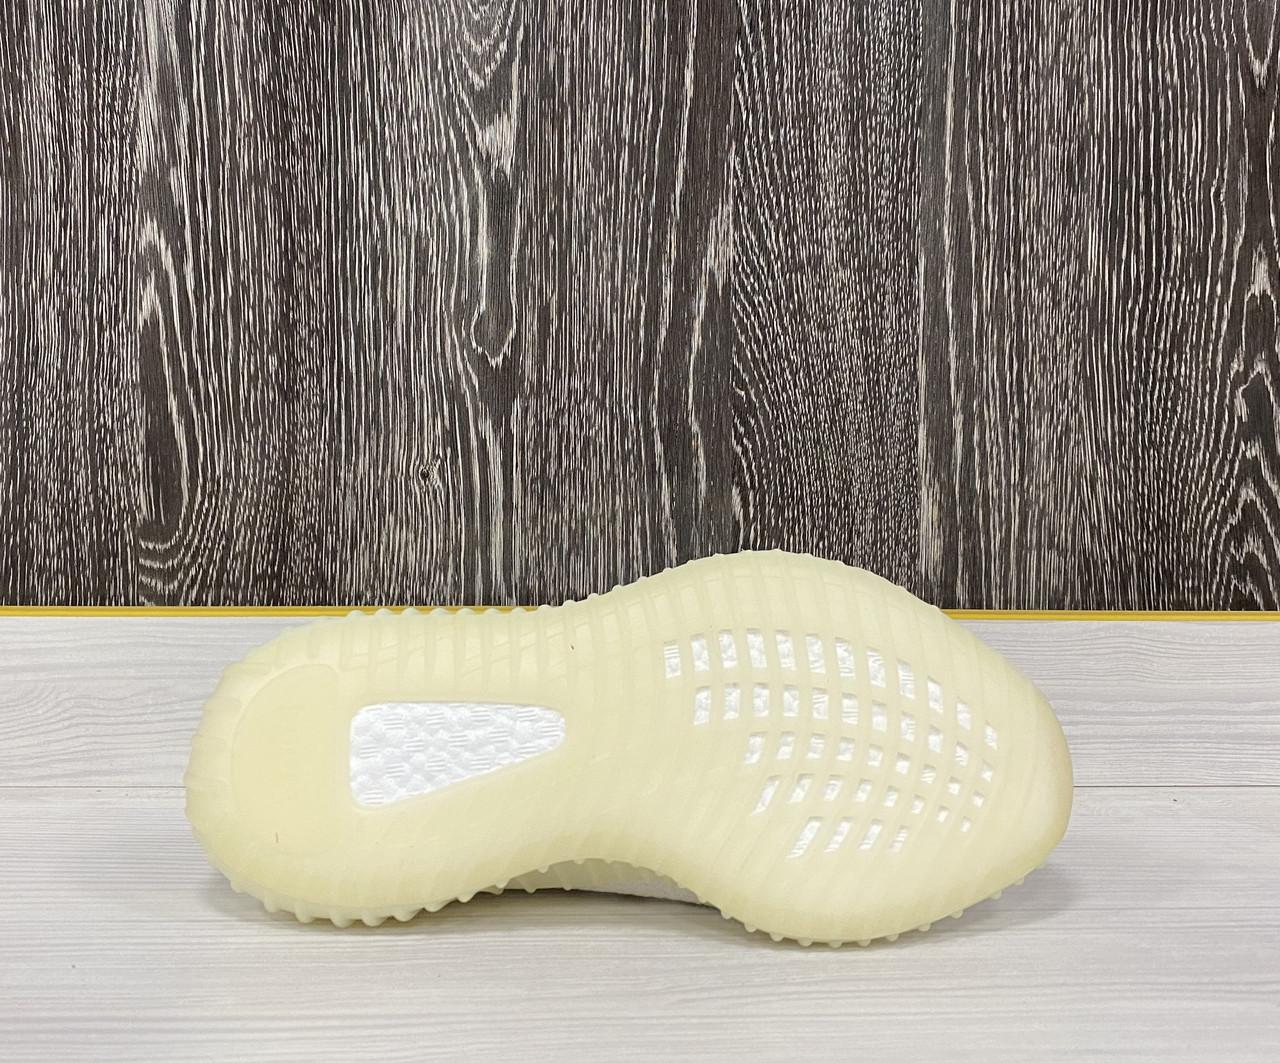 Кроссовки Adidas Yeezy Boost 350 V2 Full White - фото 5